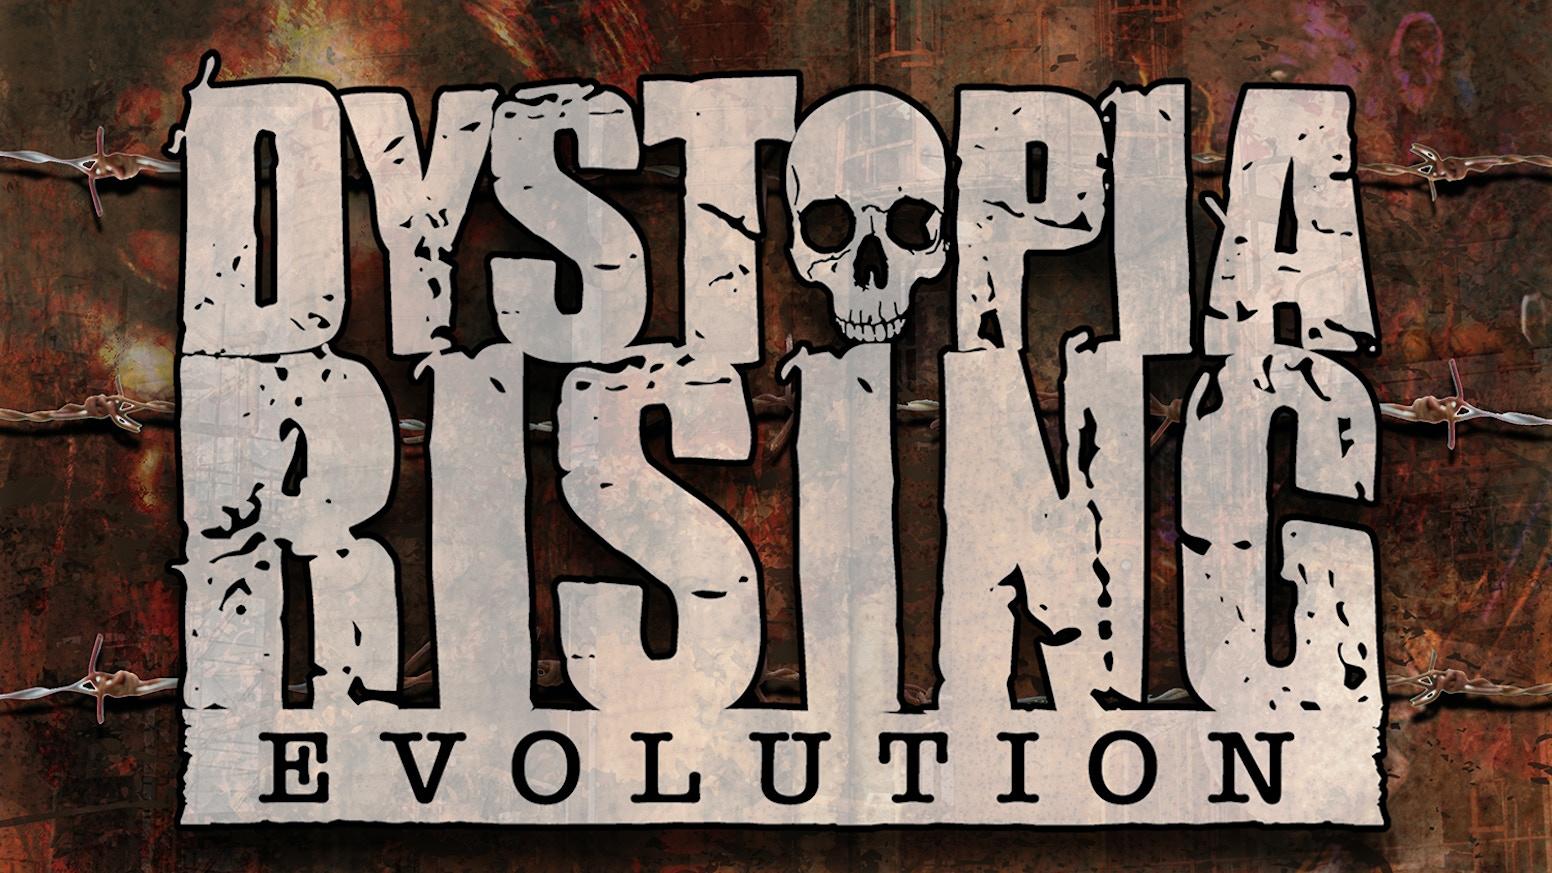 Dystopia Rising Evolution Tabletop Rpg By Richard Thomas Kickstarter